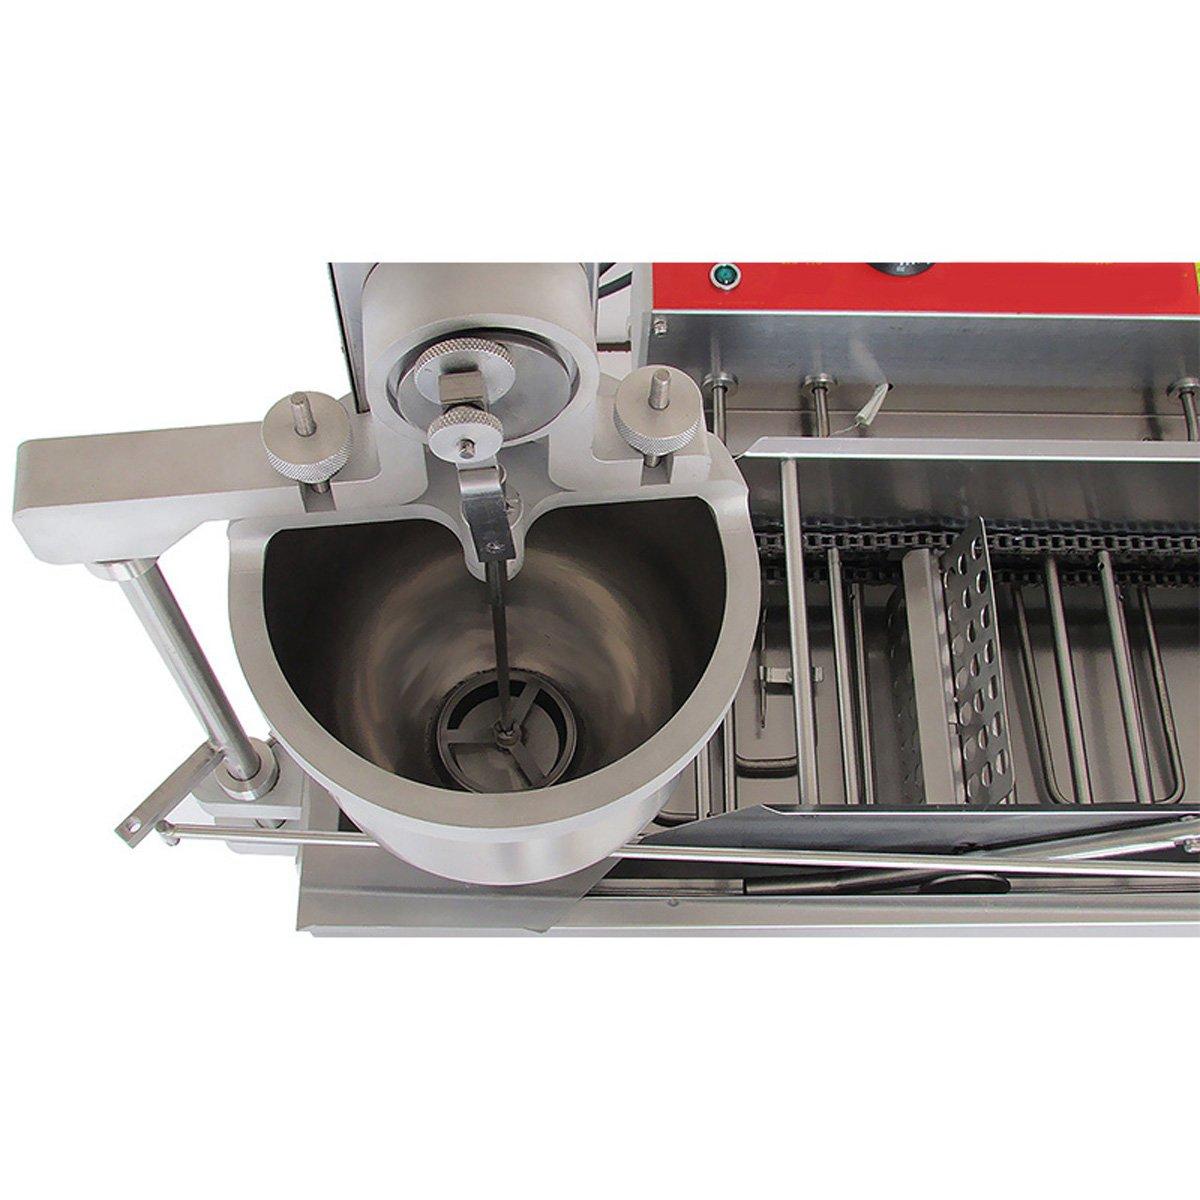 enshey 7L comercial automático máquina en forma de rosquilla Donut eléctrica sartén sartén de máquina/Auto Donuts moldura Turning collecting Donut freidora ...